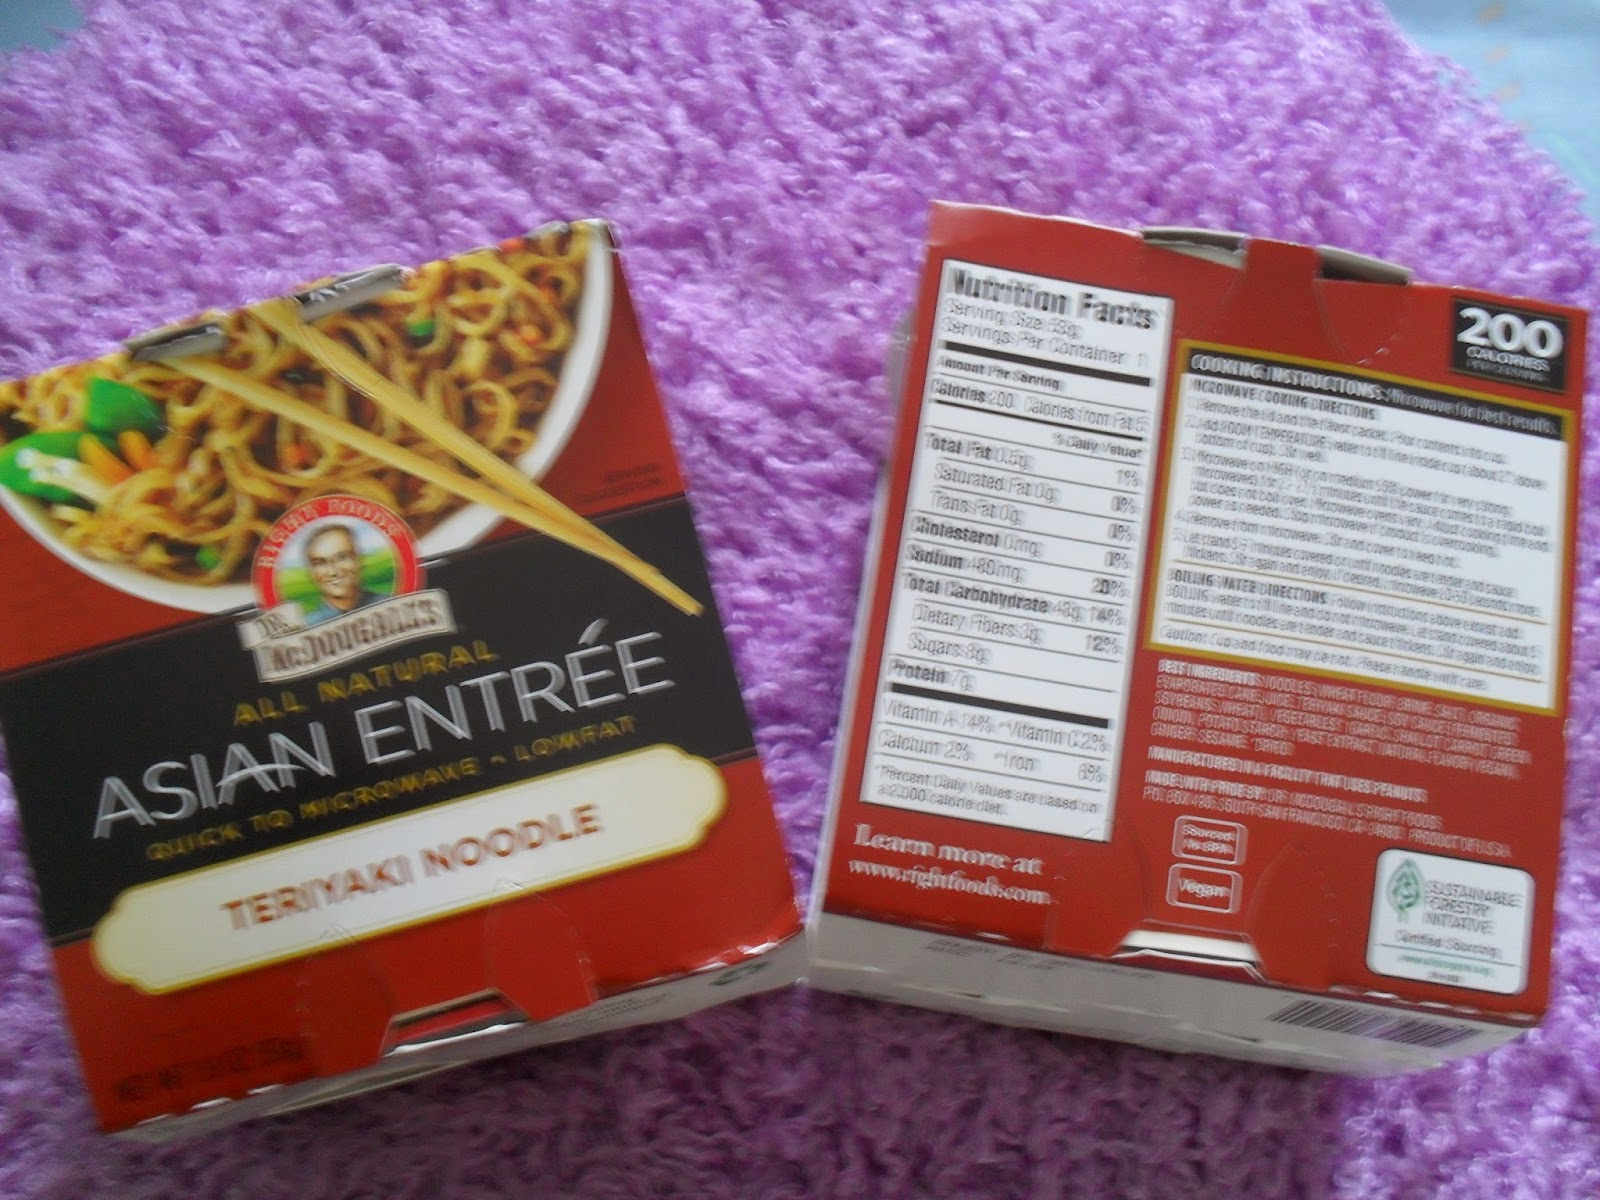 Dr. McDougall's, Asian Entree, Teriyaki Noodle